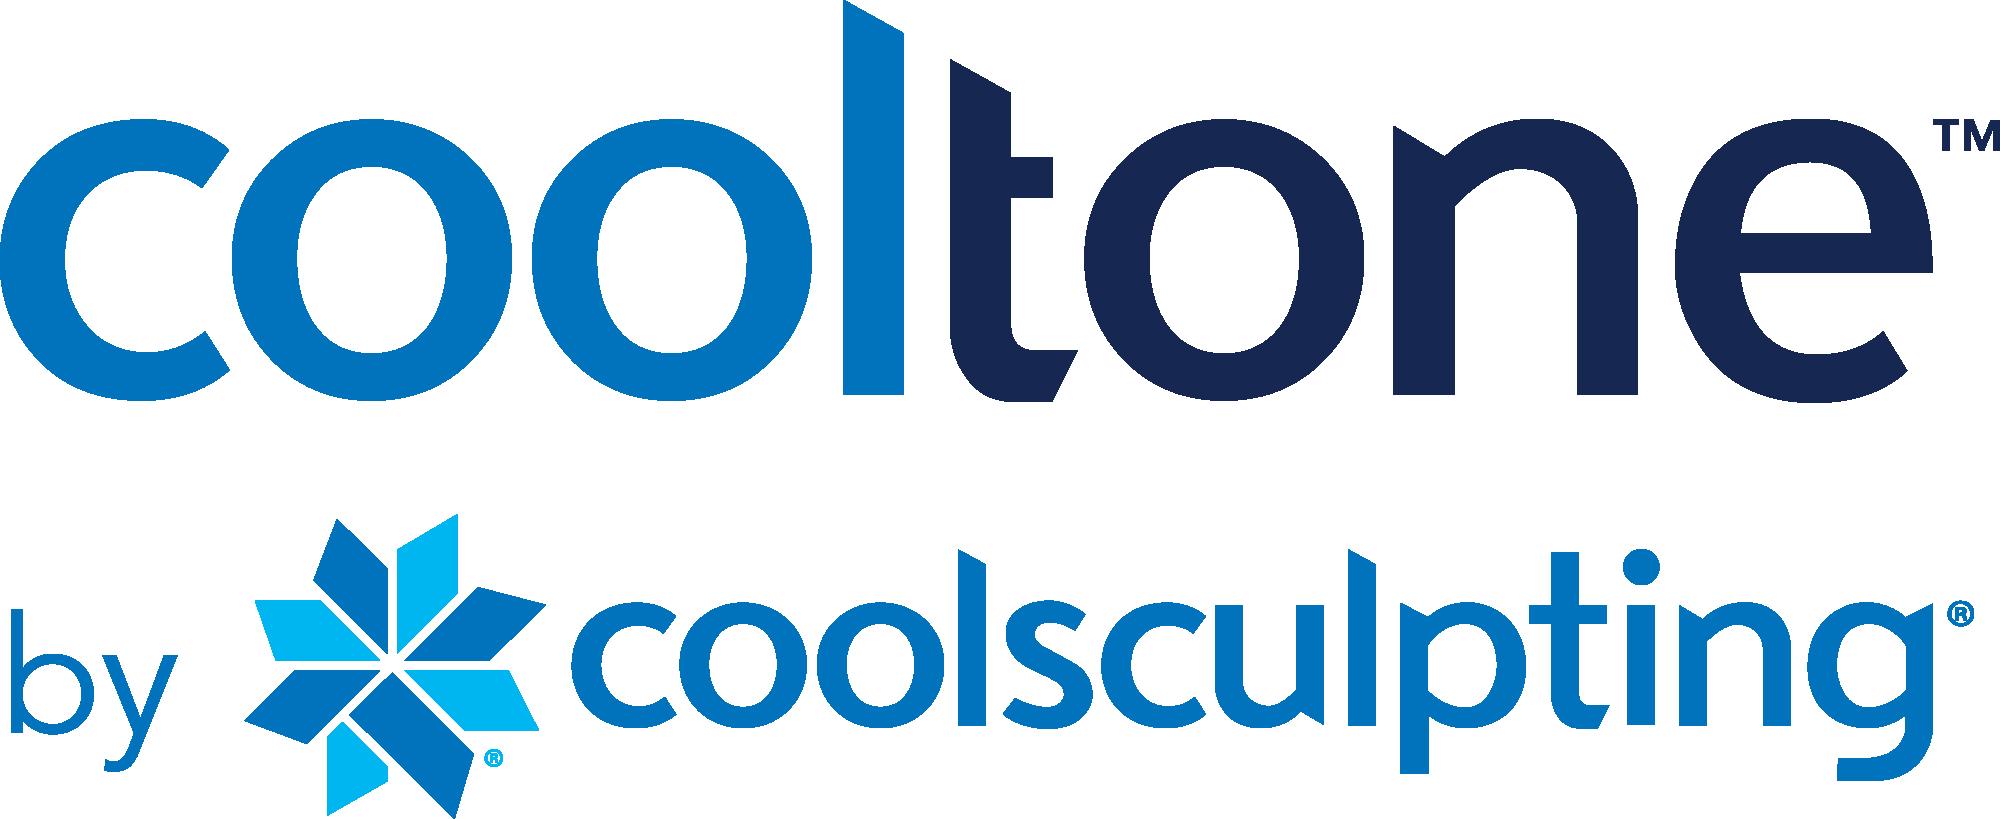 CoolTone